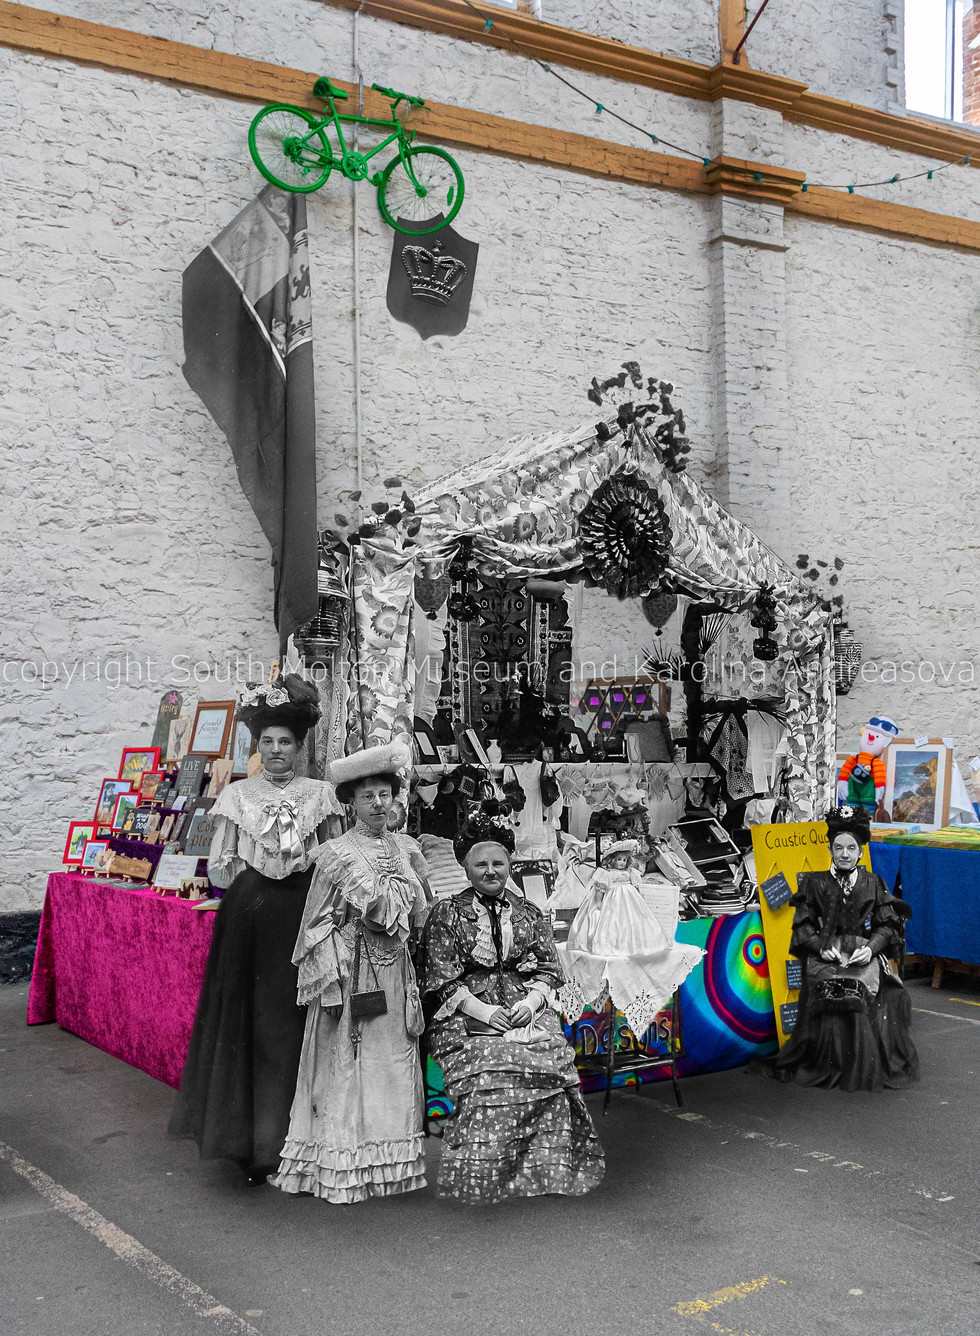 21 market stall 03 MERGED.jpg